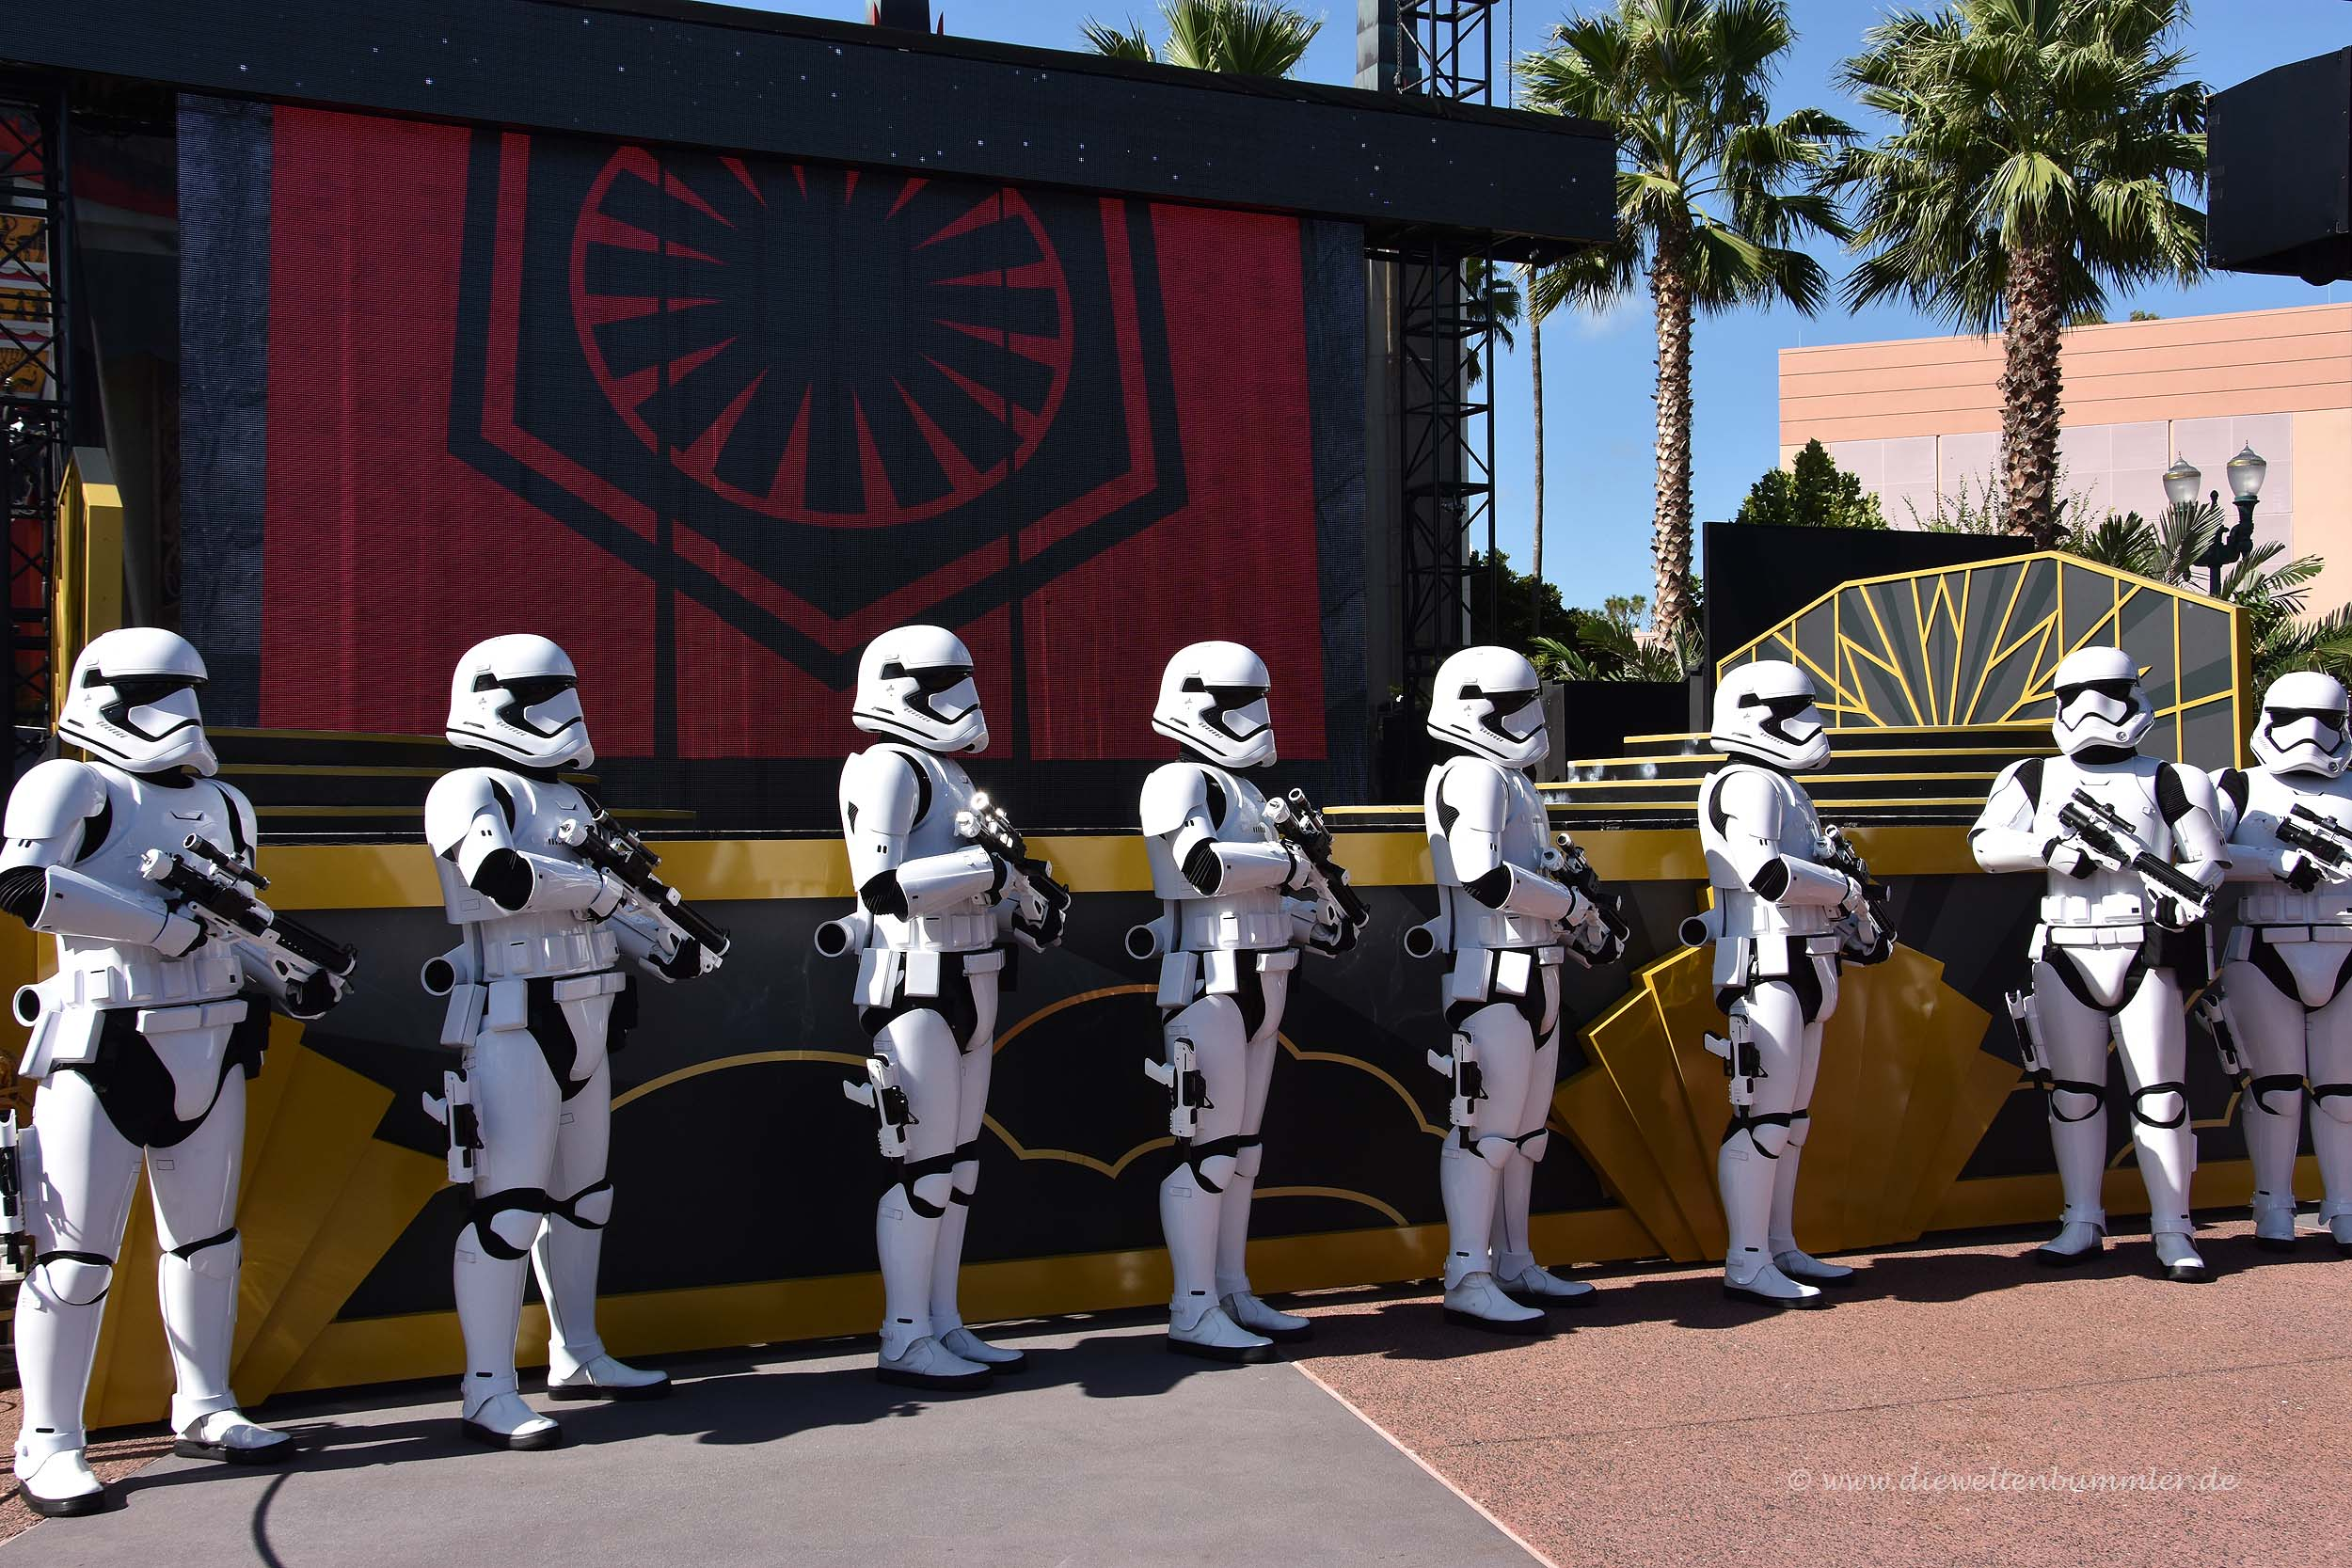 Star Wars in Disney World